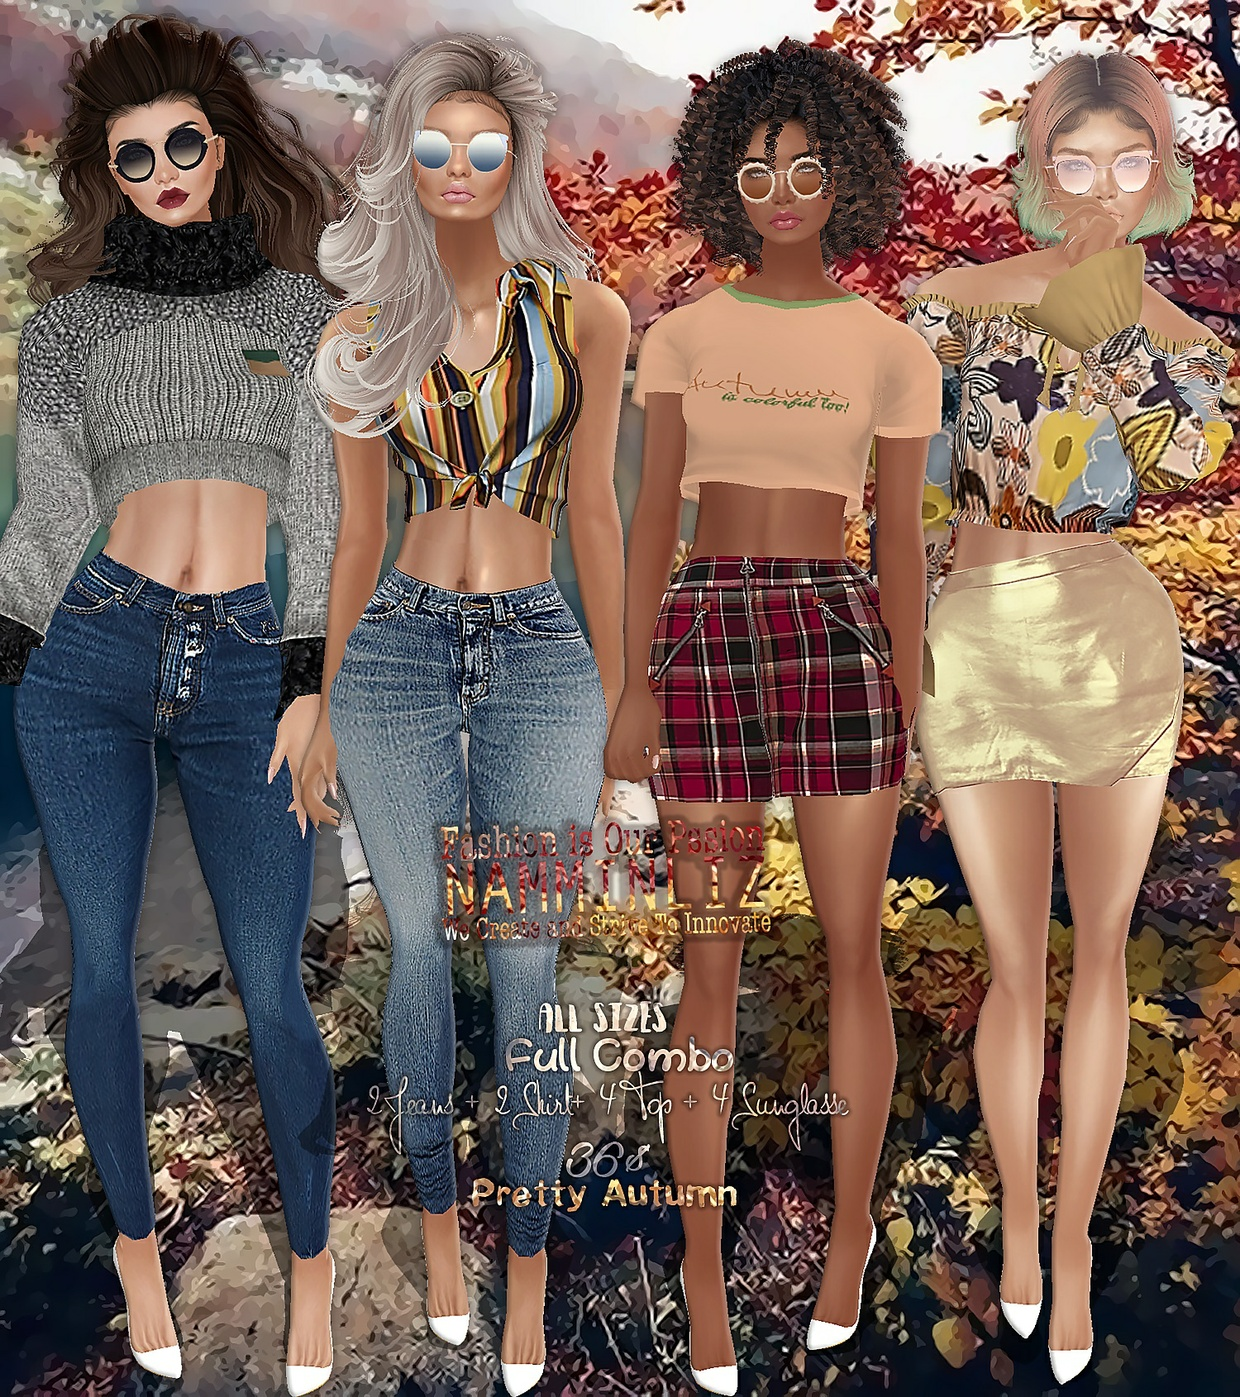 Pretty Autumn combo4 Skirt Bibirasta + Tops +  Sunglasse